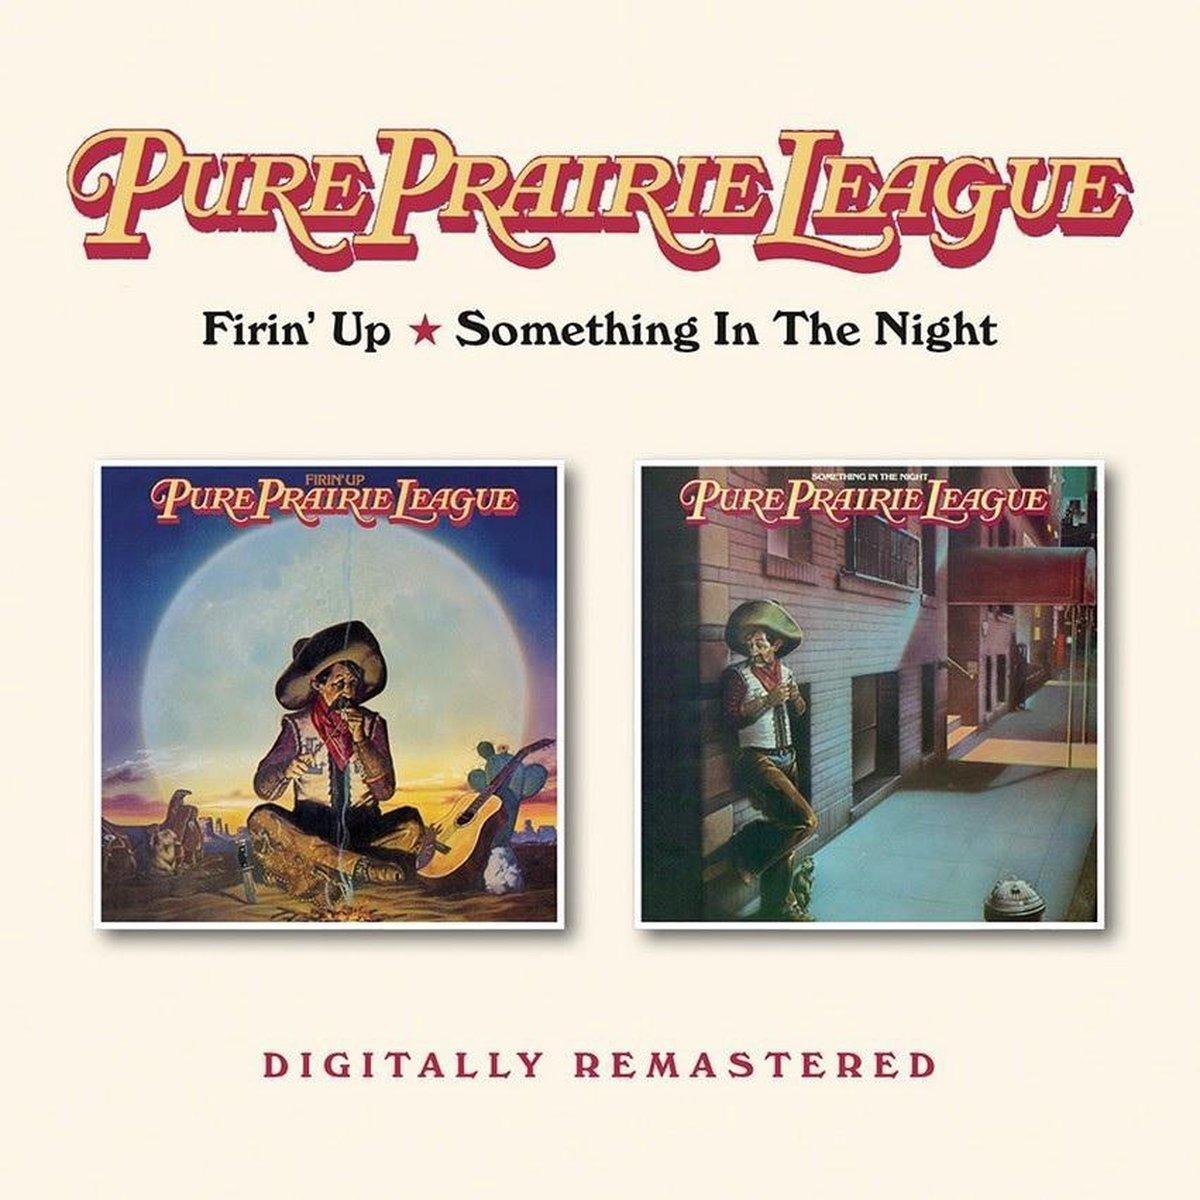 CD PURE PRAIRIE LEAGUE - FIRIN' UP/SOMETHING IN THE NIGHT